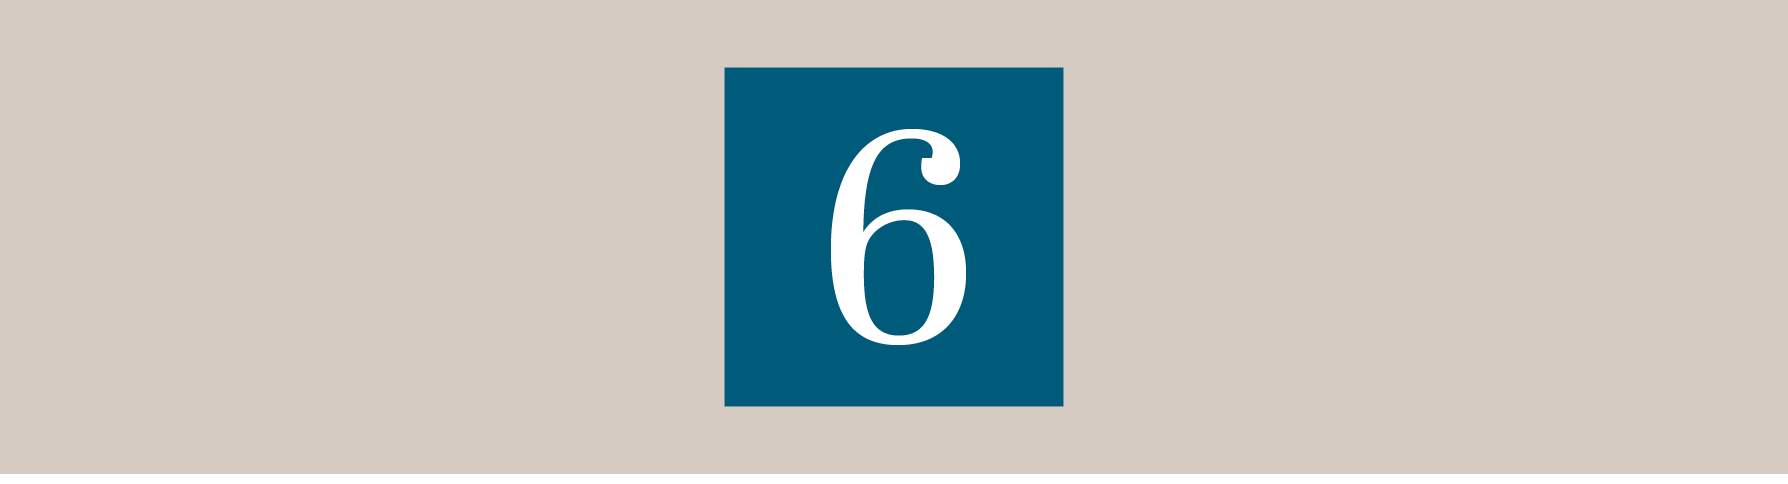 module 6 - sales